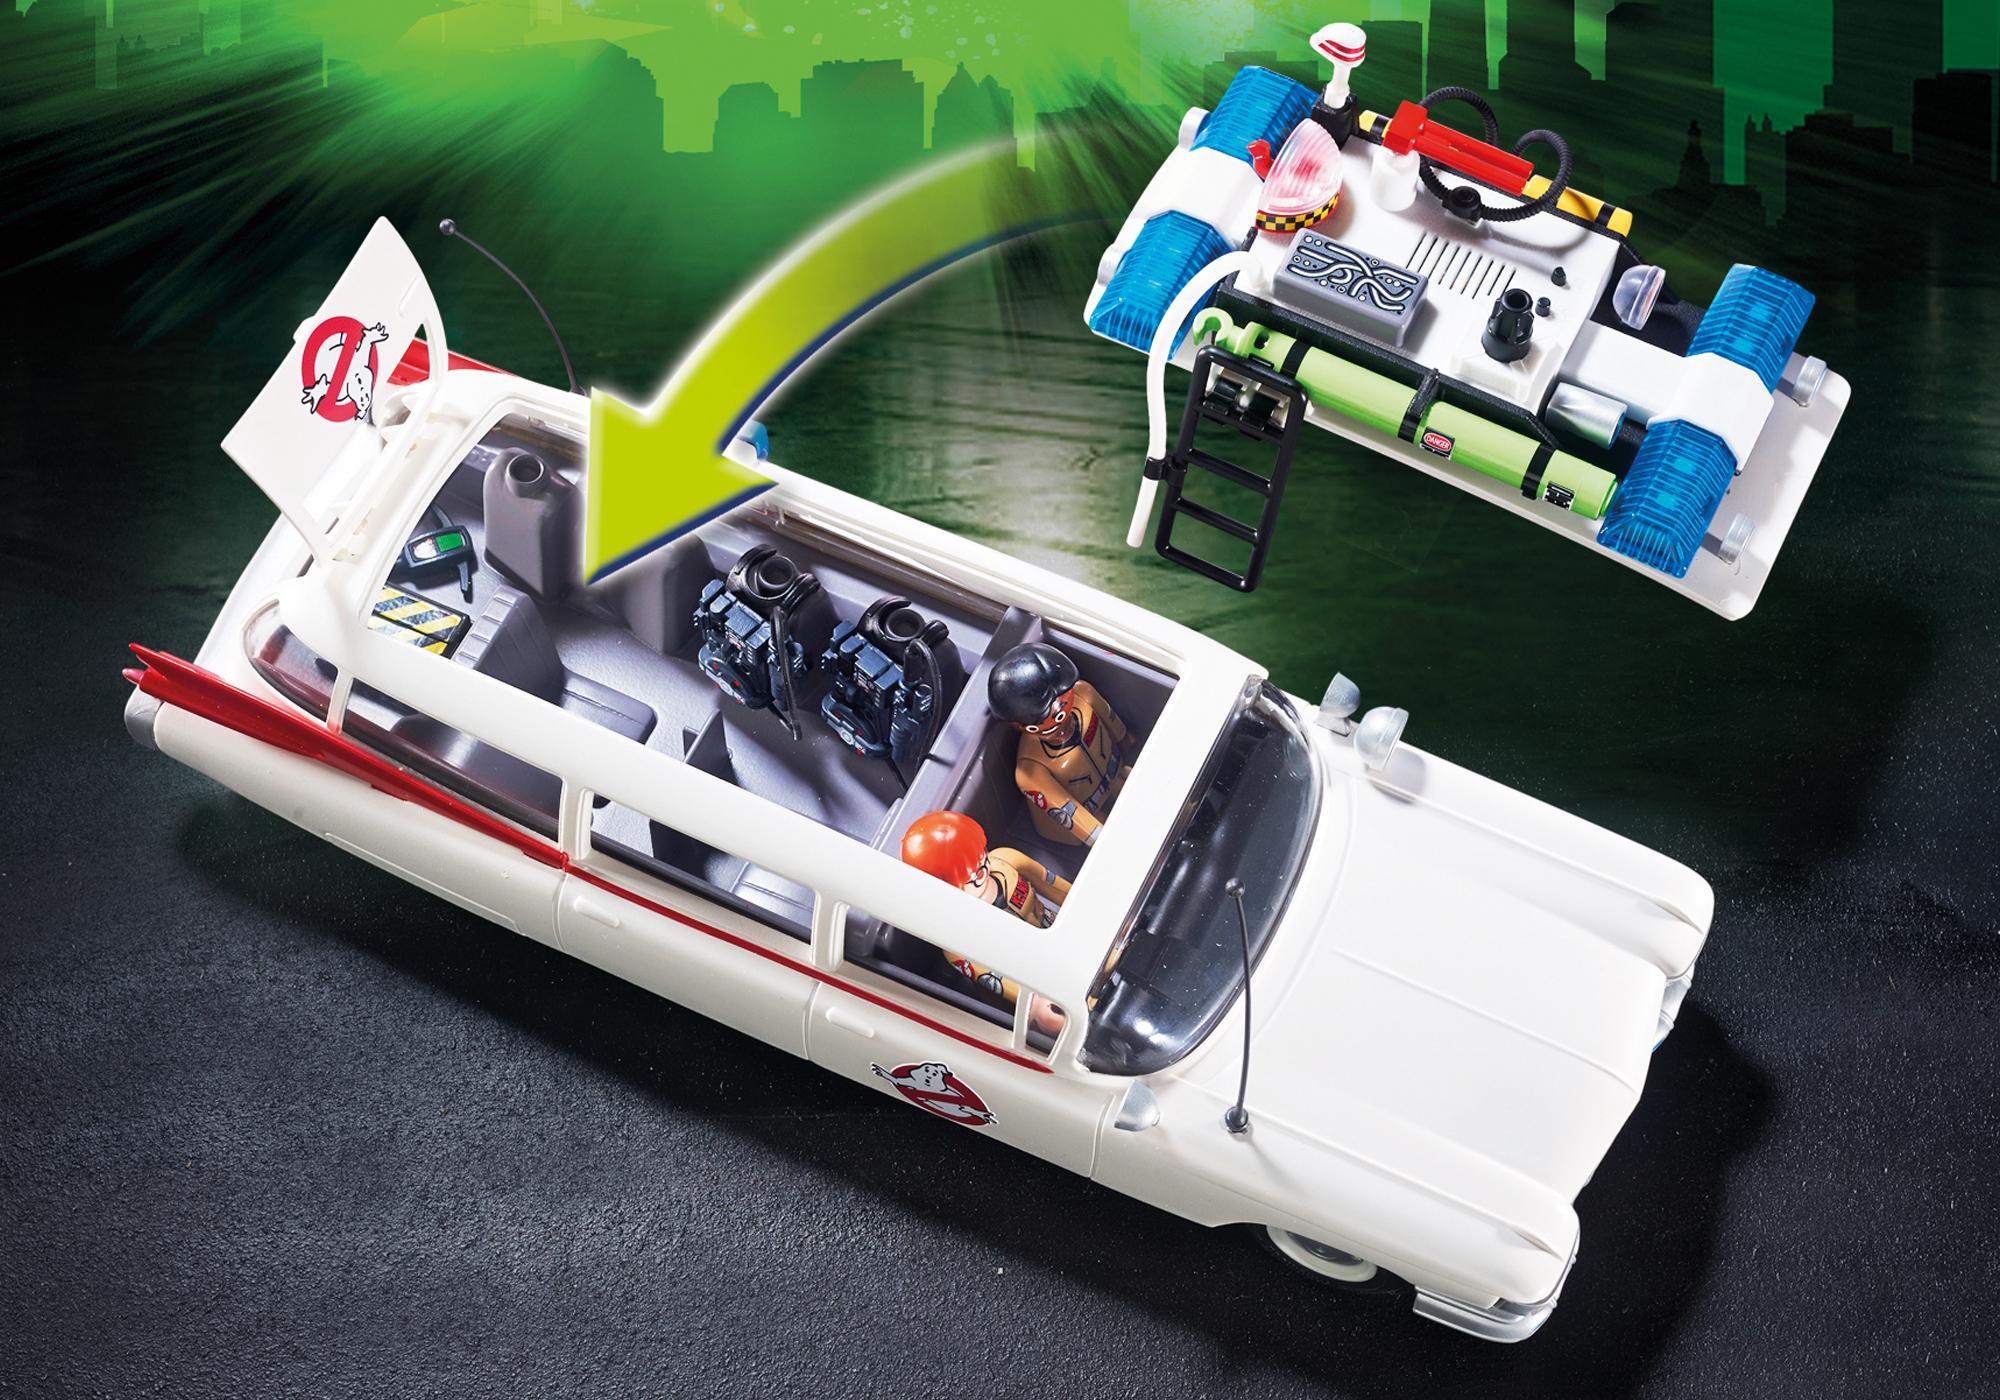 http://media.playmobil.com/i/playmobil/9220_product_extra2/Ghostbusters™ Ecto-1